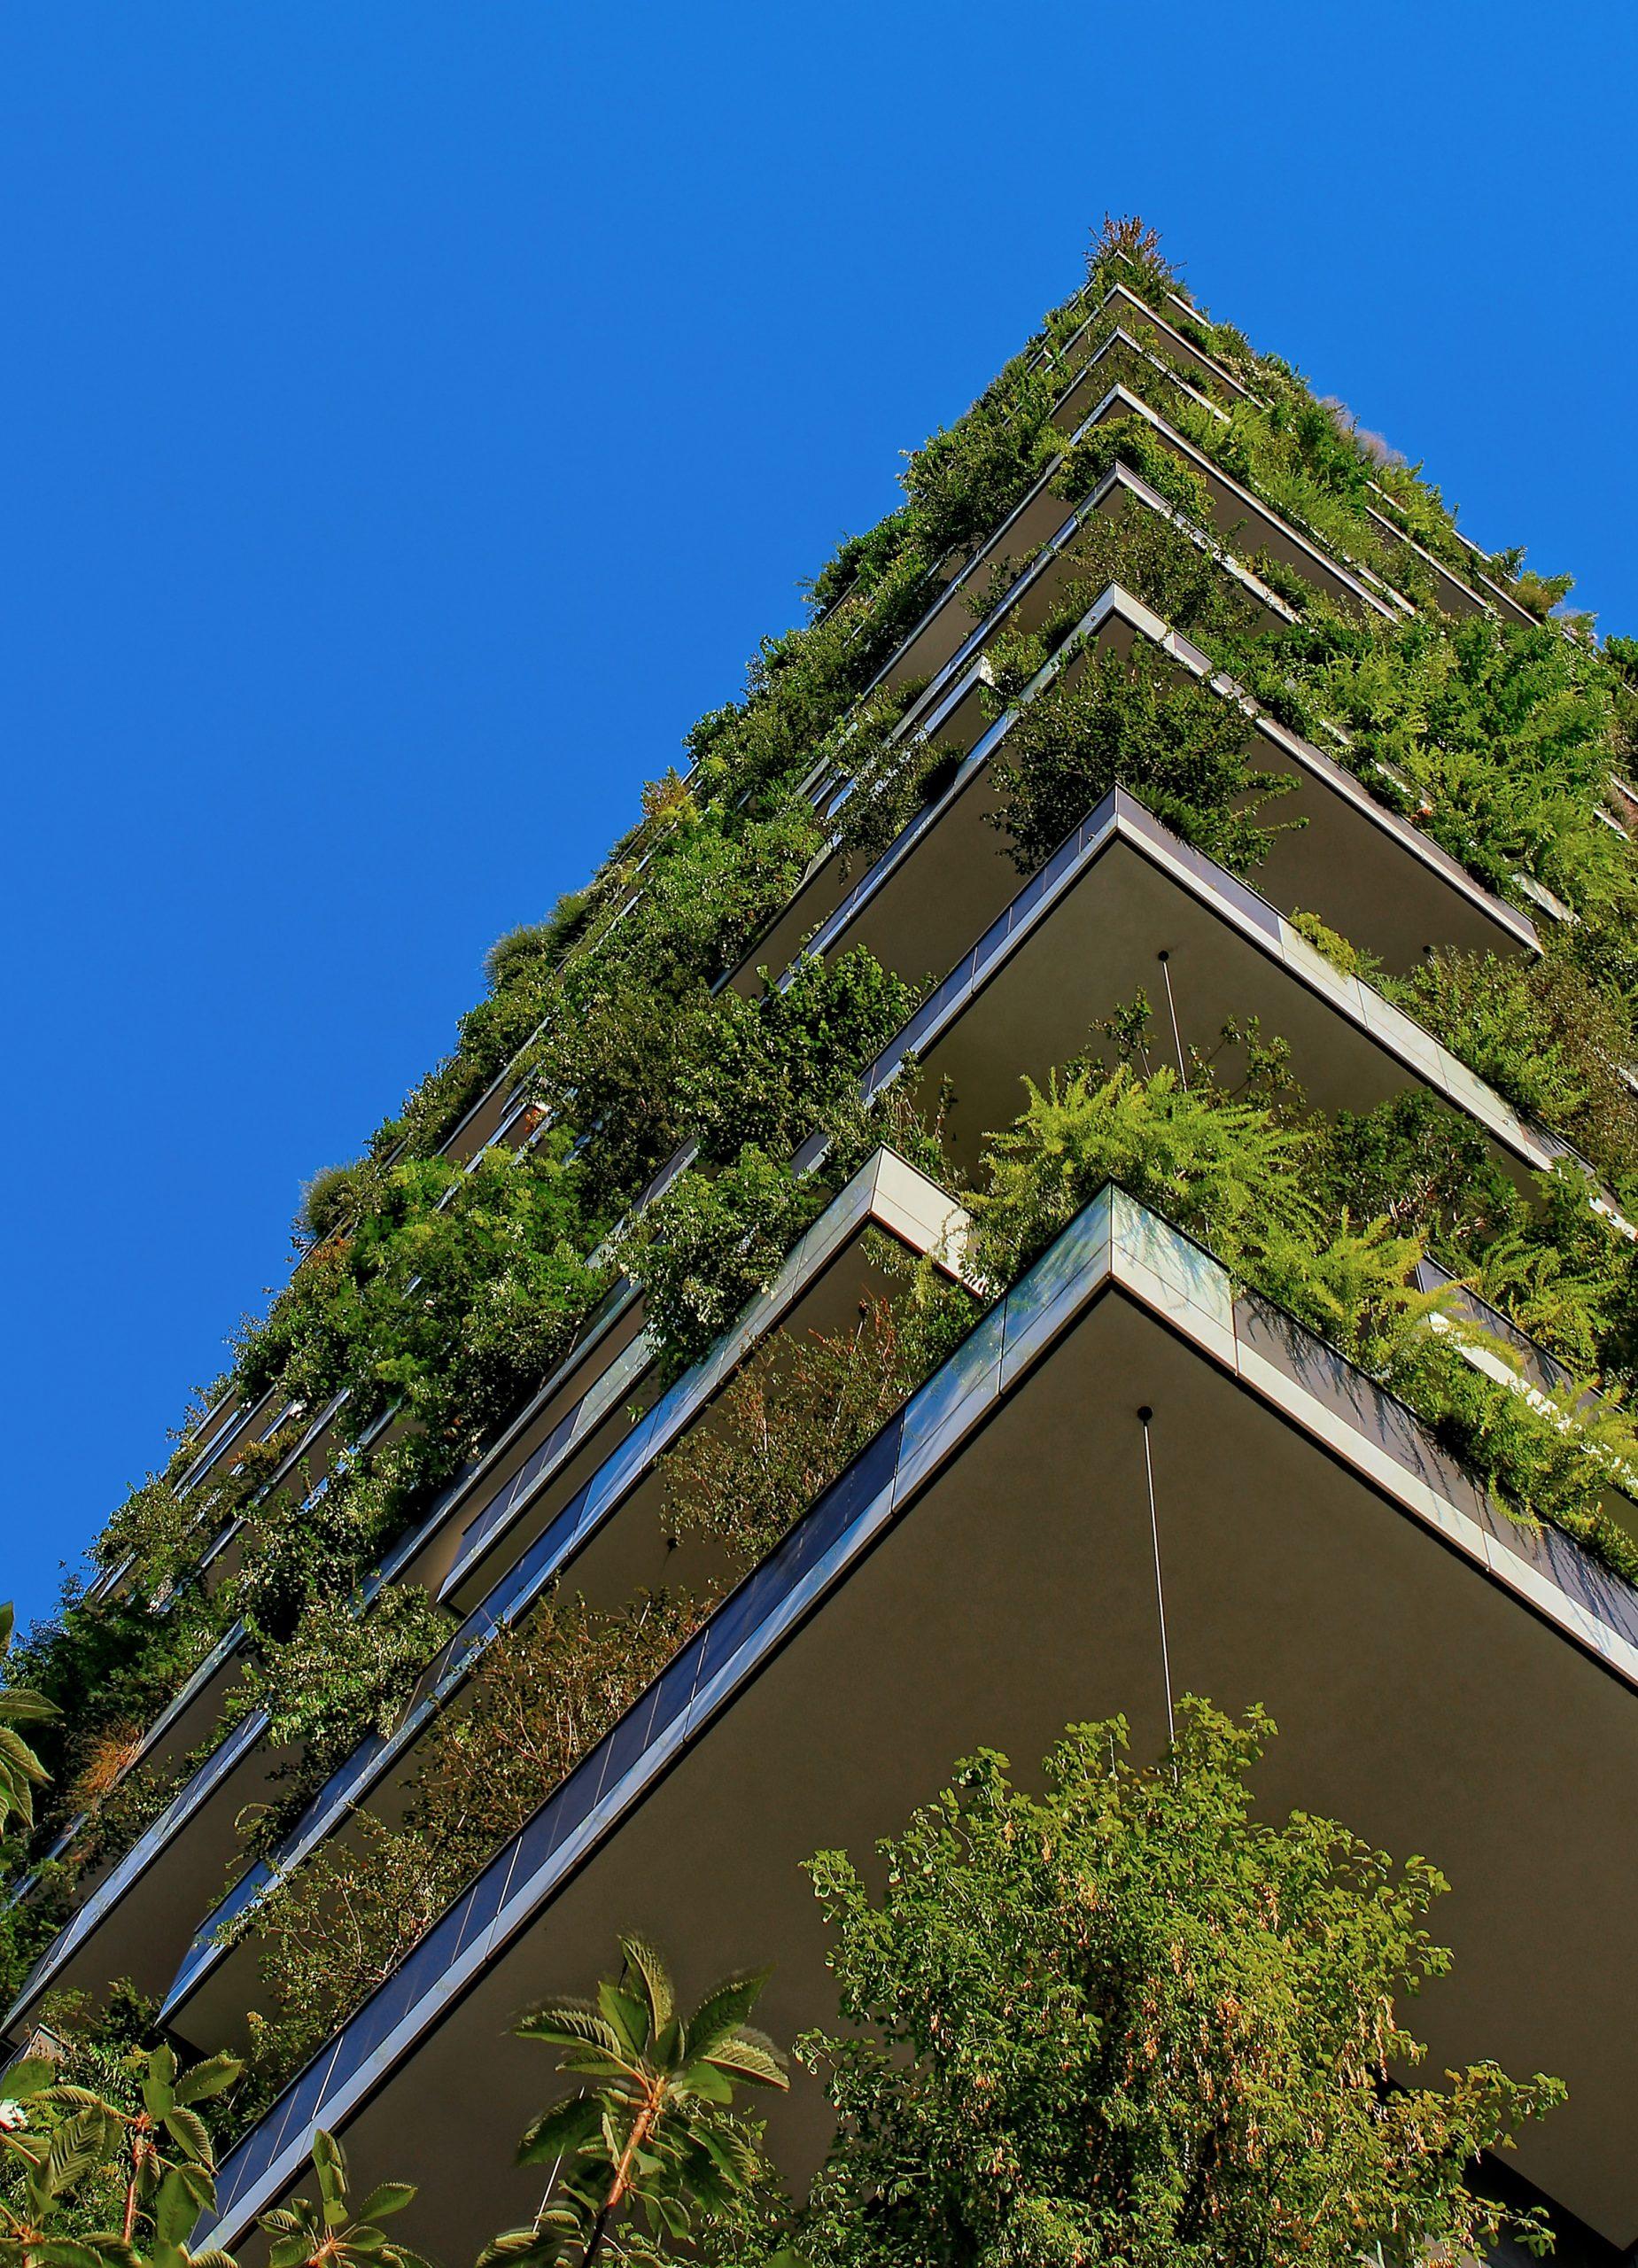 Green balconies against blue sky